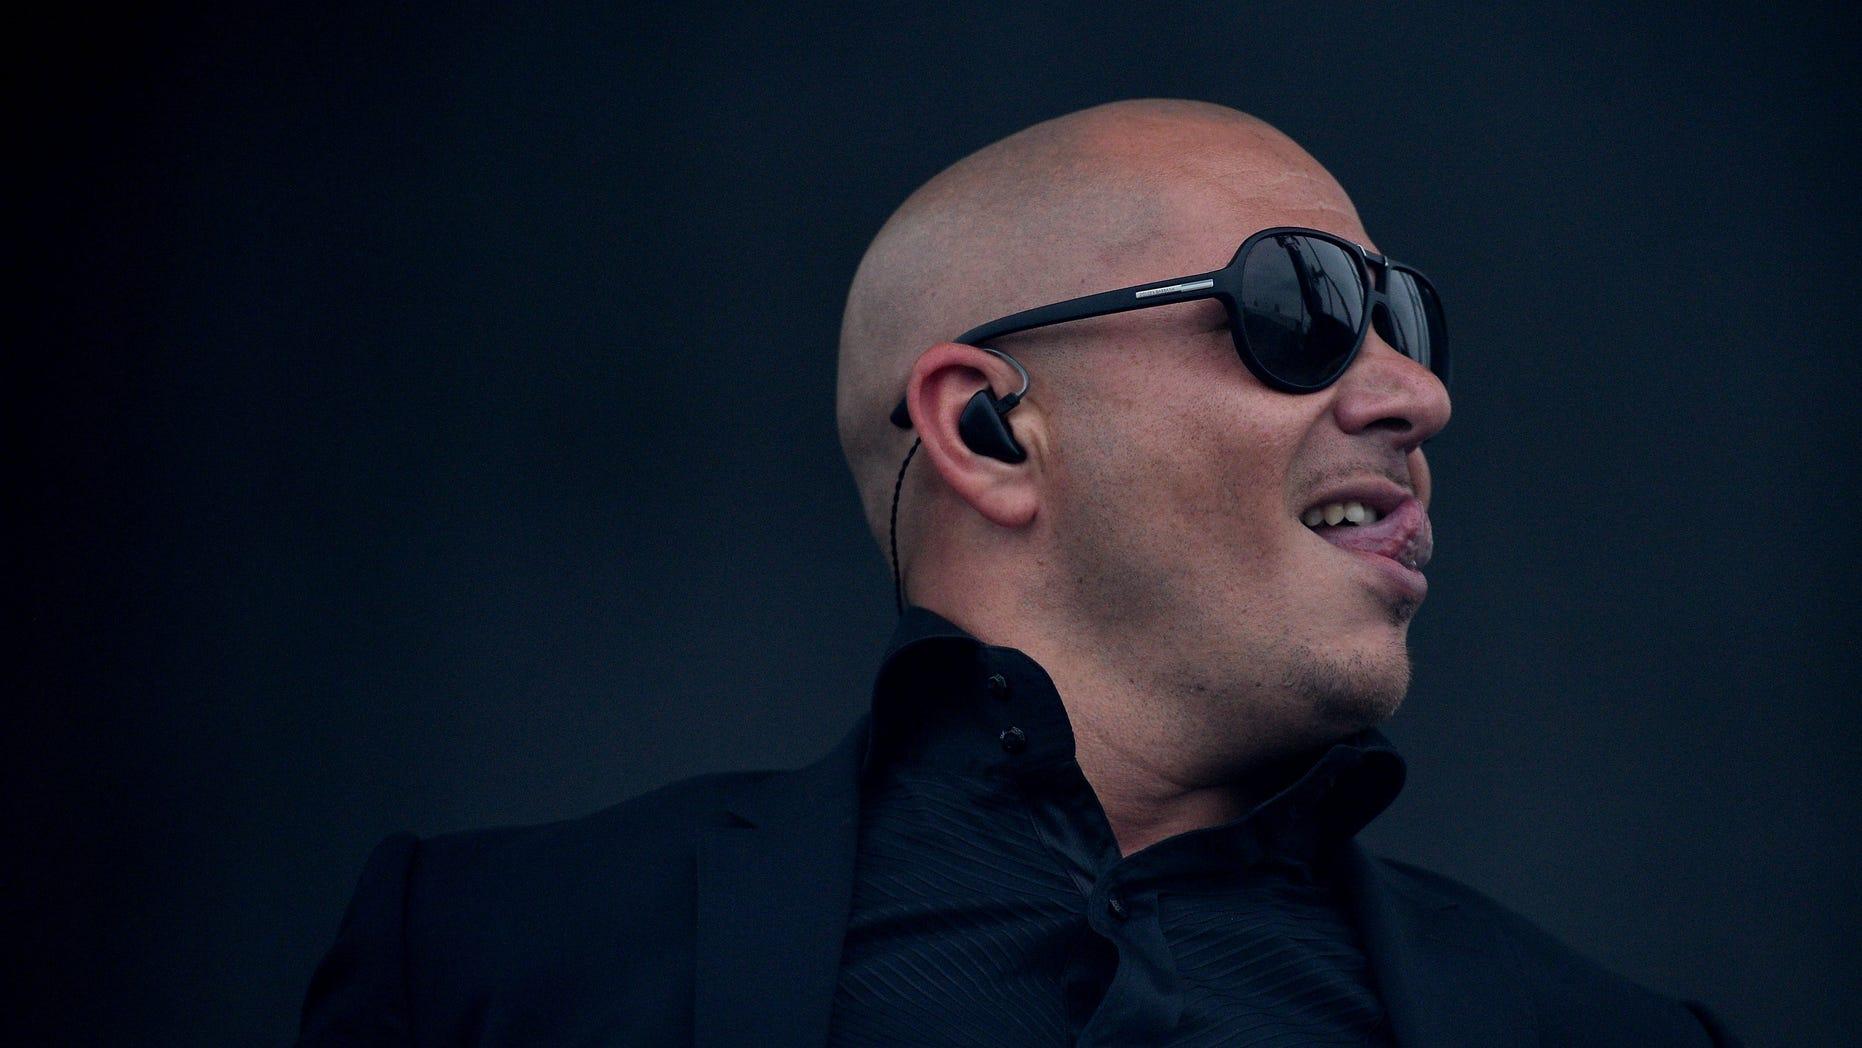 Rapper Armando 'Pitbul' Perez on May 18, 2013 in Baltimore, Maryland.